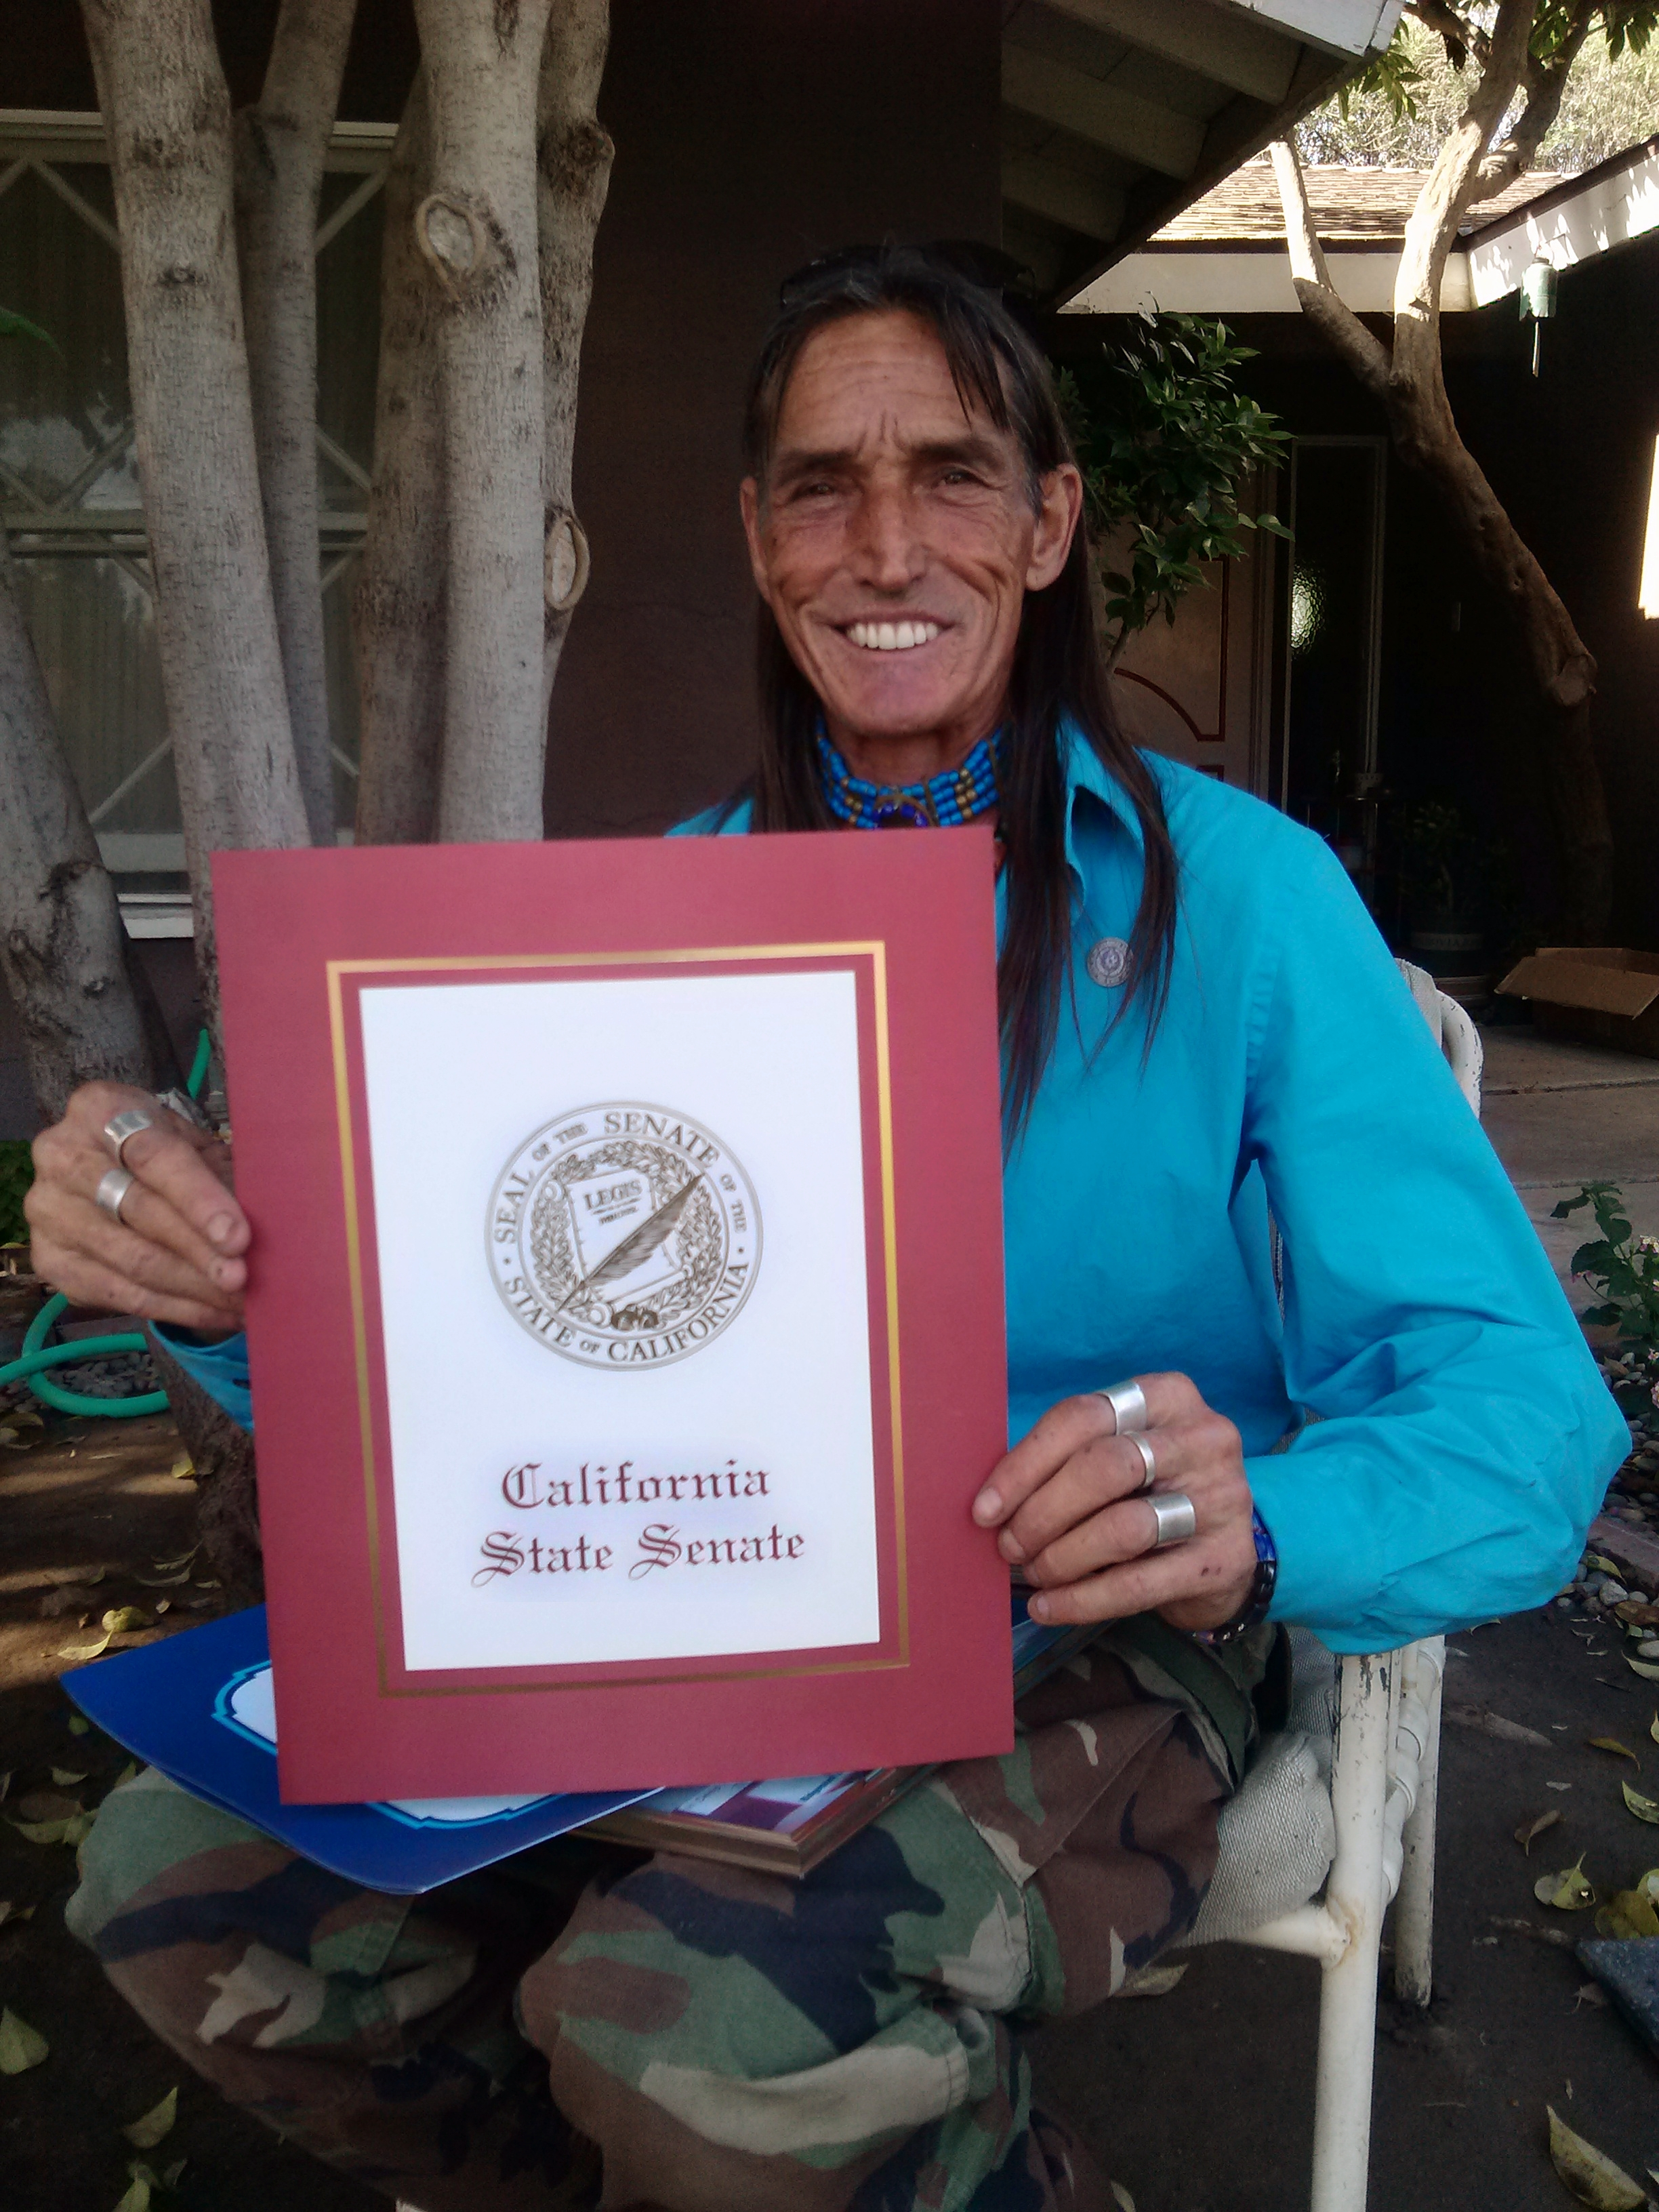 Richard Lonewolf with California State Senate Award